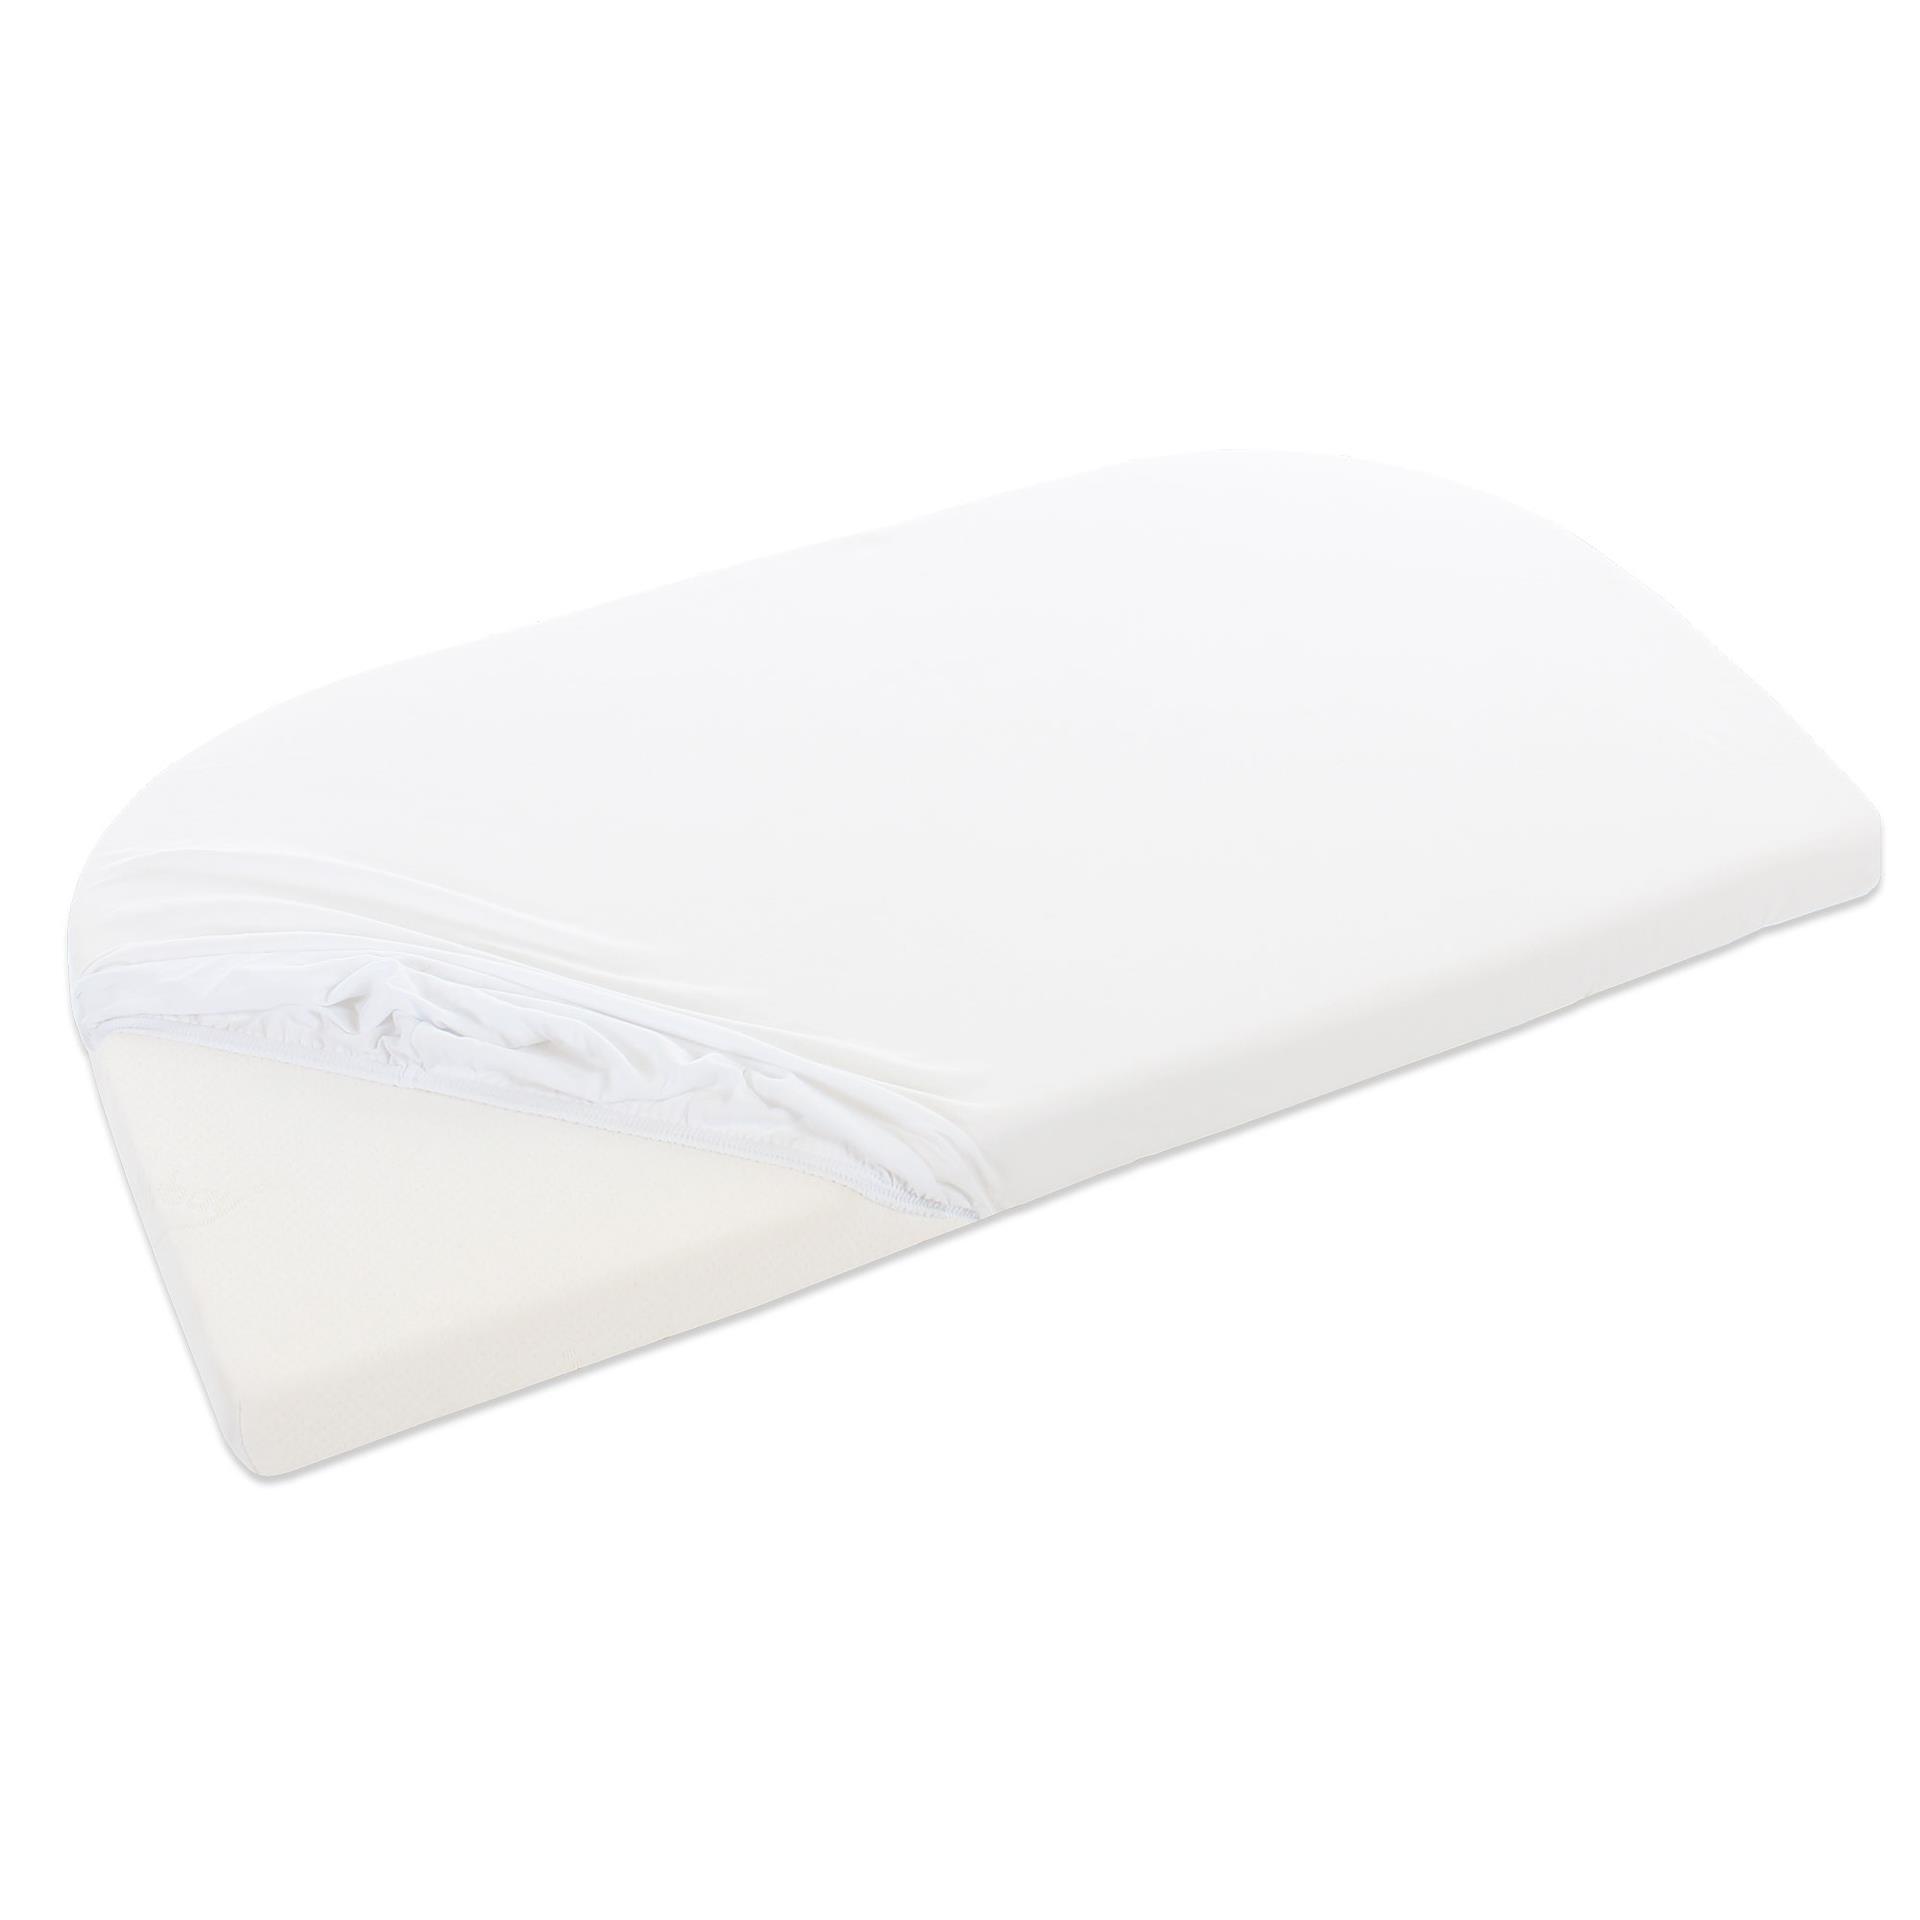 organic cotton jersey bez ge babybay maxi advance beistellbetten. Black Bedroom Furniture Sets. Home Design Ideas